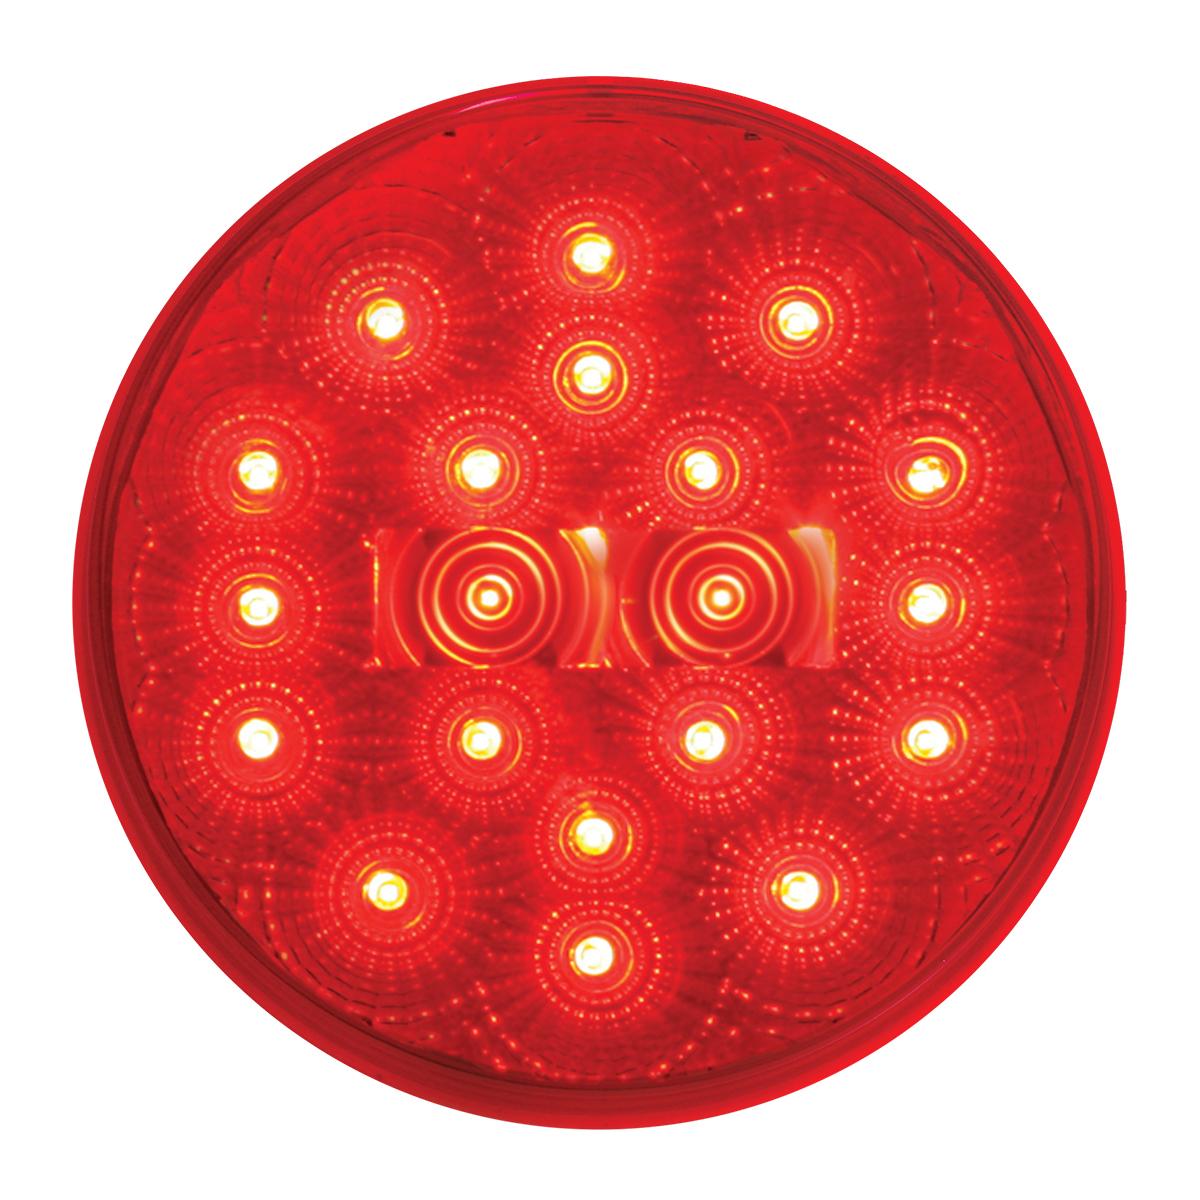 "77093 4"" Spyder LED Light in Red/Red"